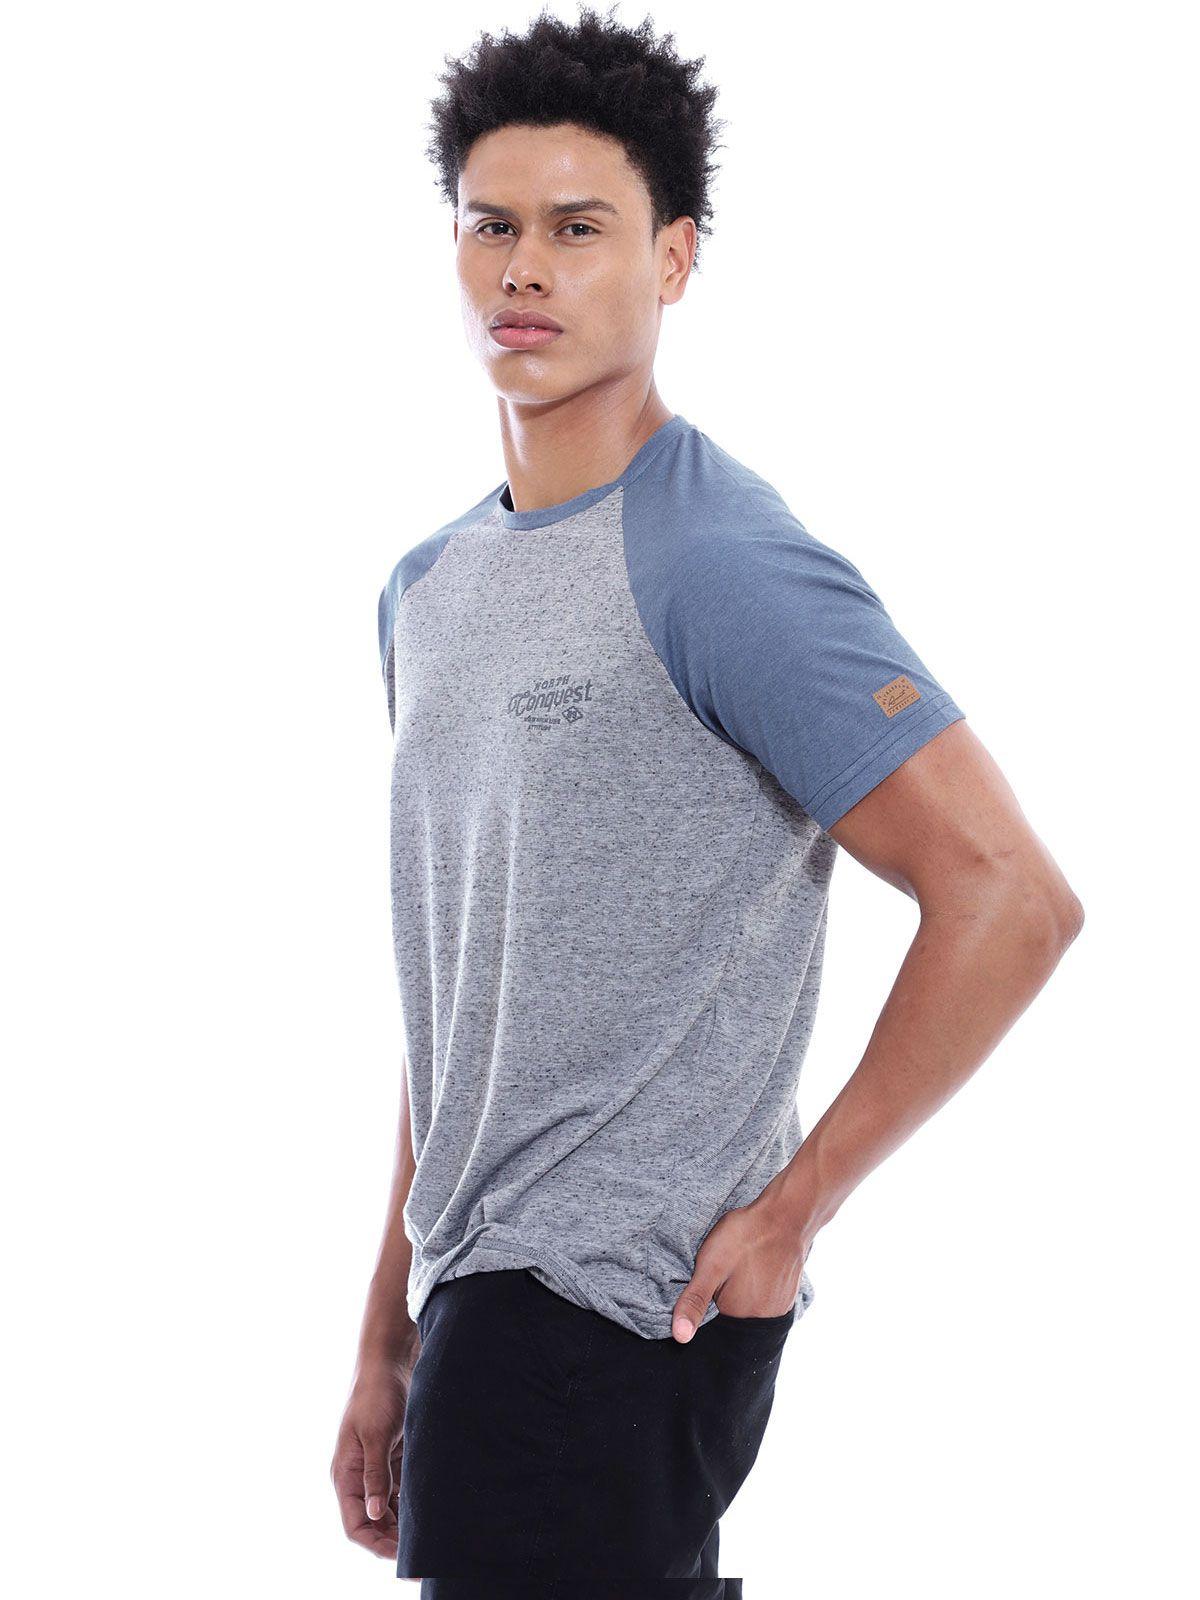 Camiseta Masculina Manga Ragla Gola Careca Botone Cinza